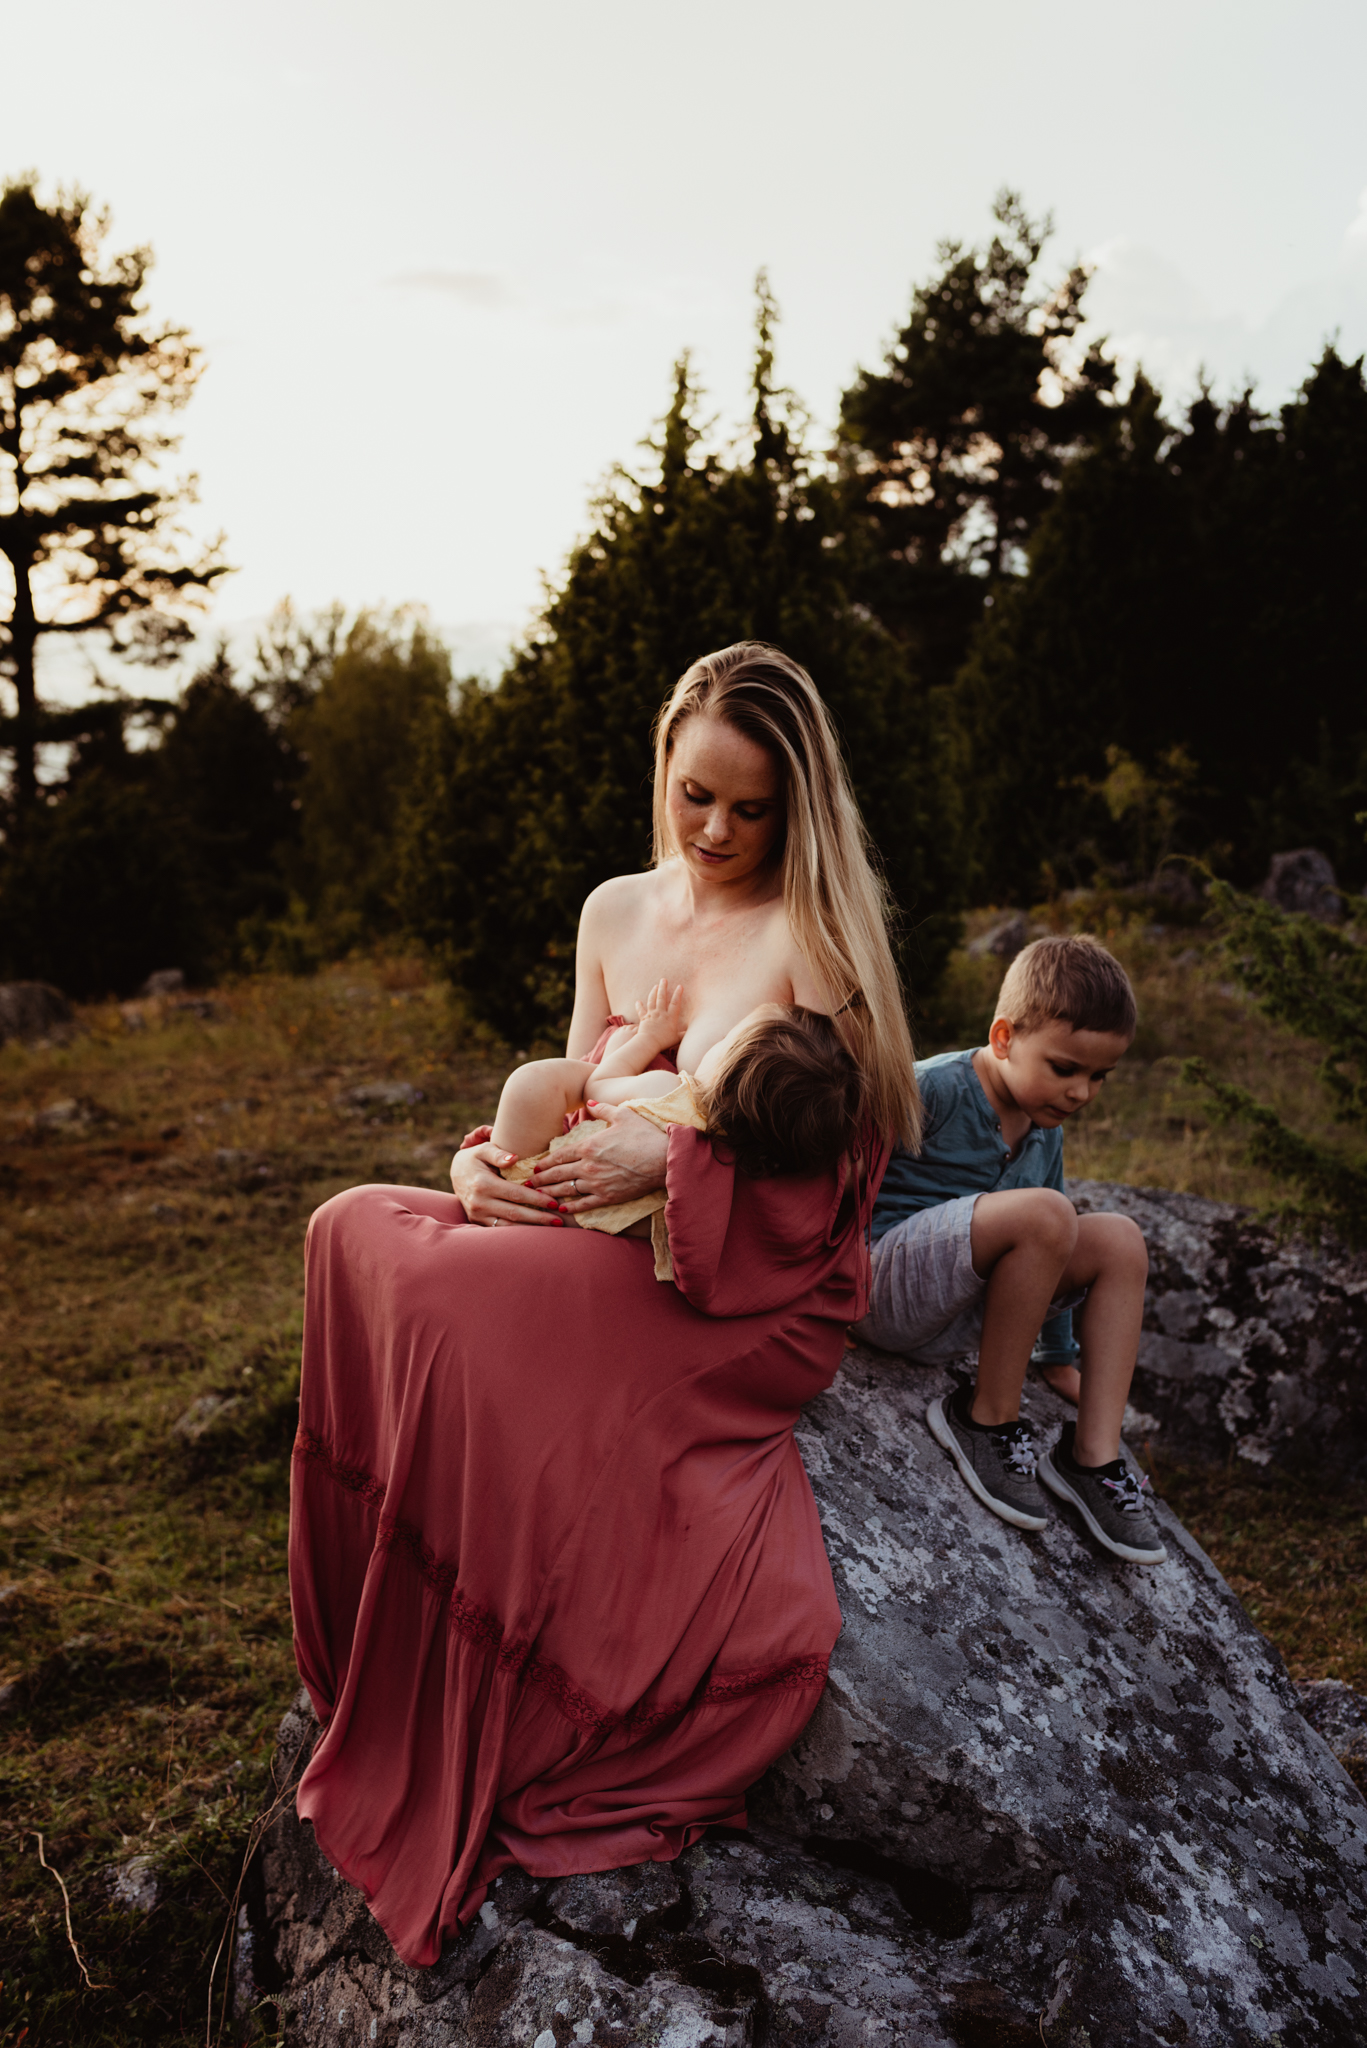 Familjefotografering Stockholm - Jasmine 15